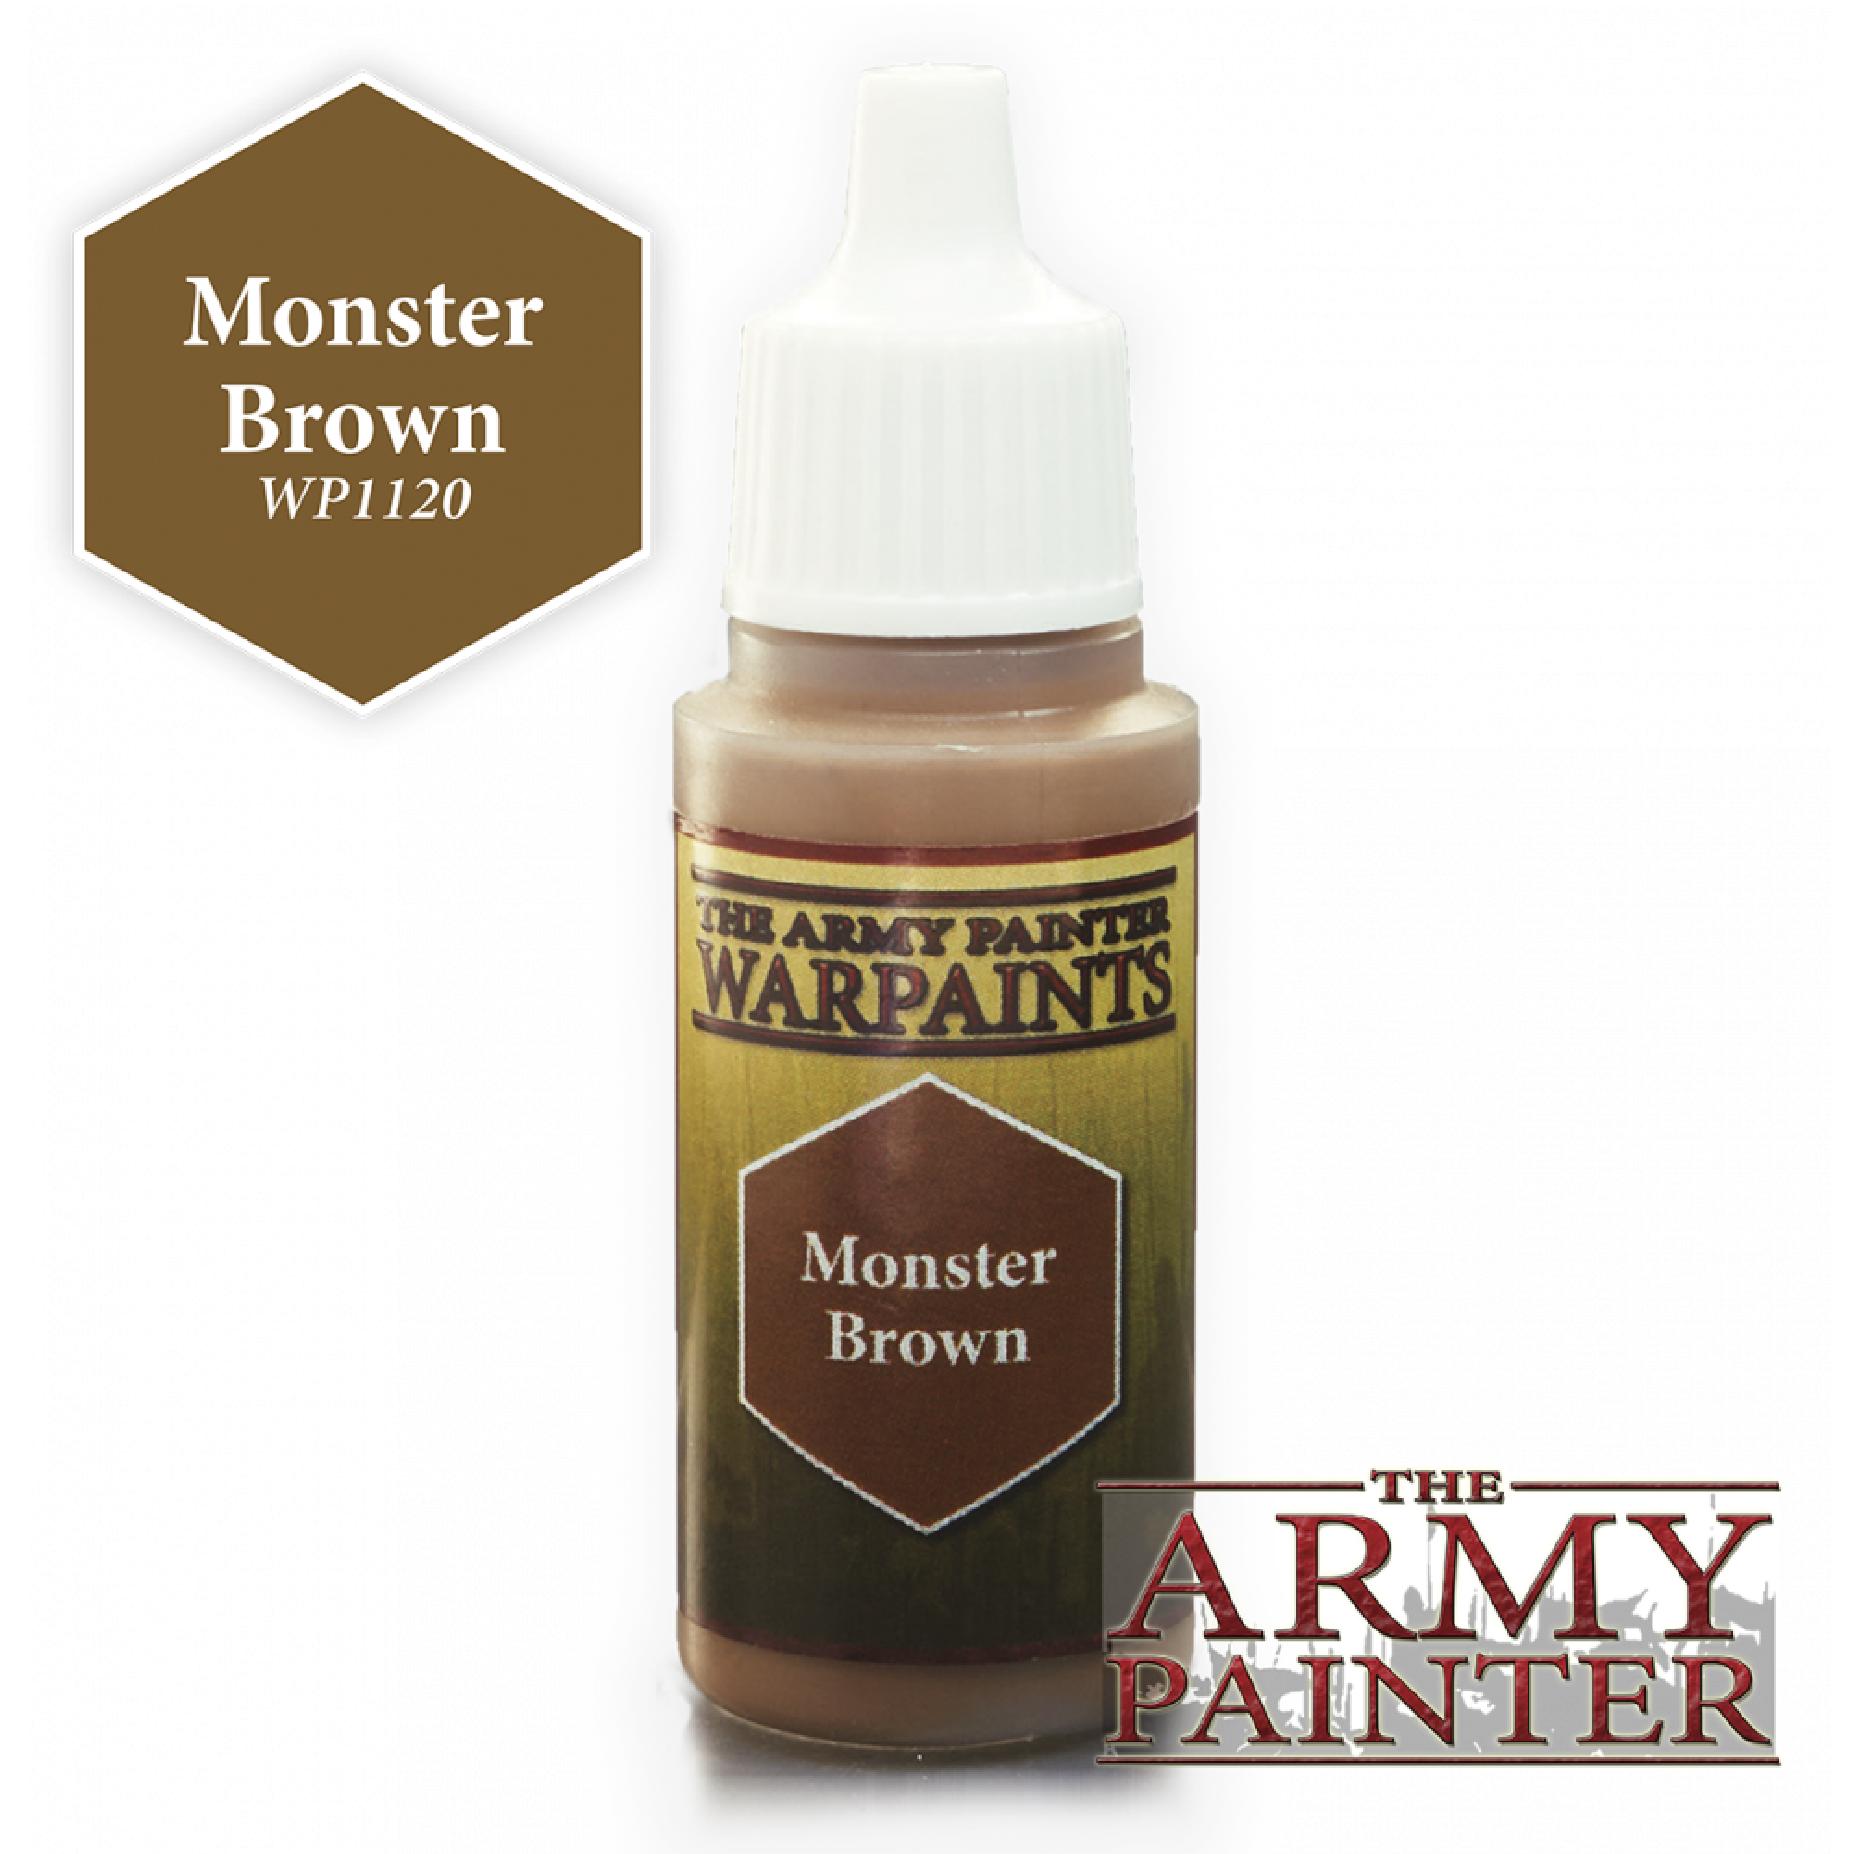 Army Painter Warpaint - Monster Brown